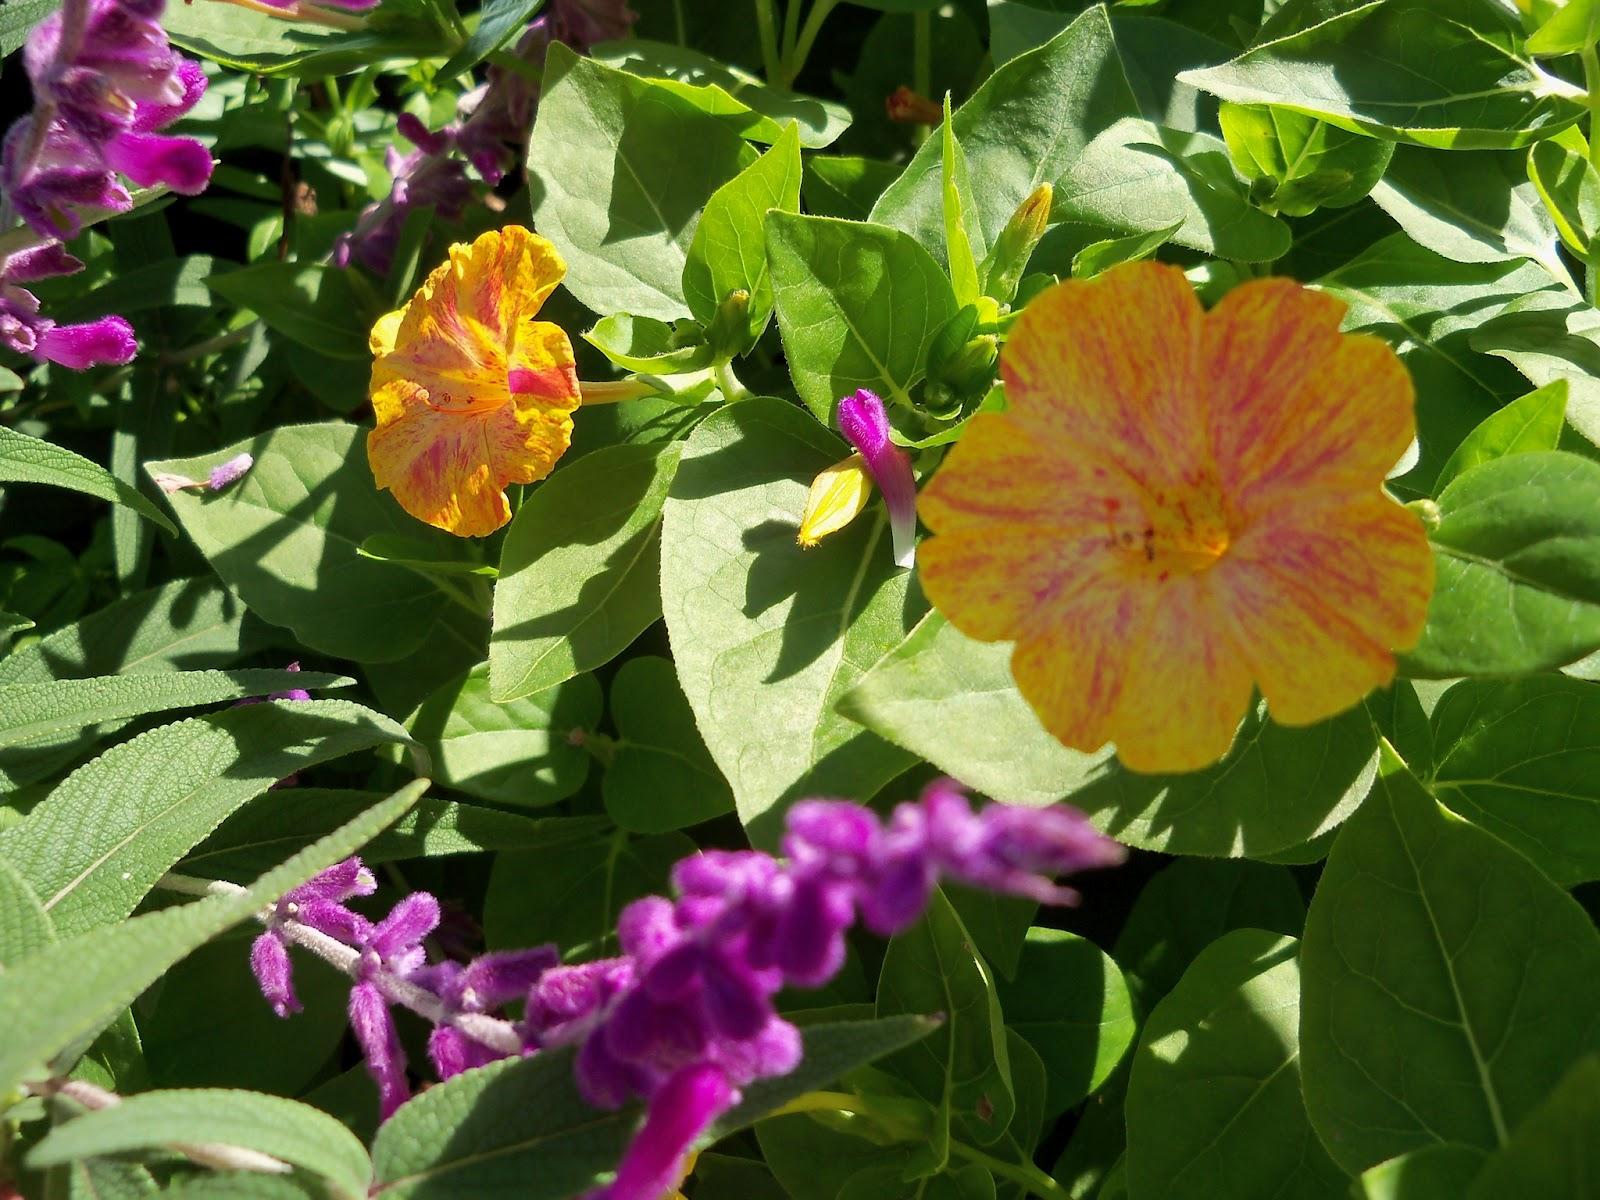 Gardening 2012 - 115_1541.JPG